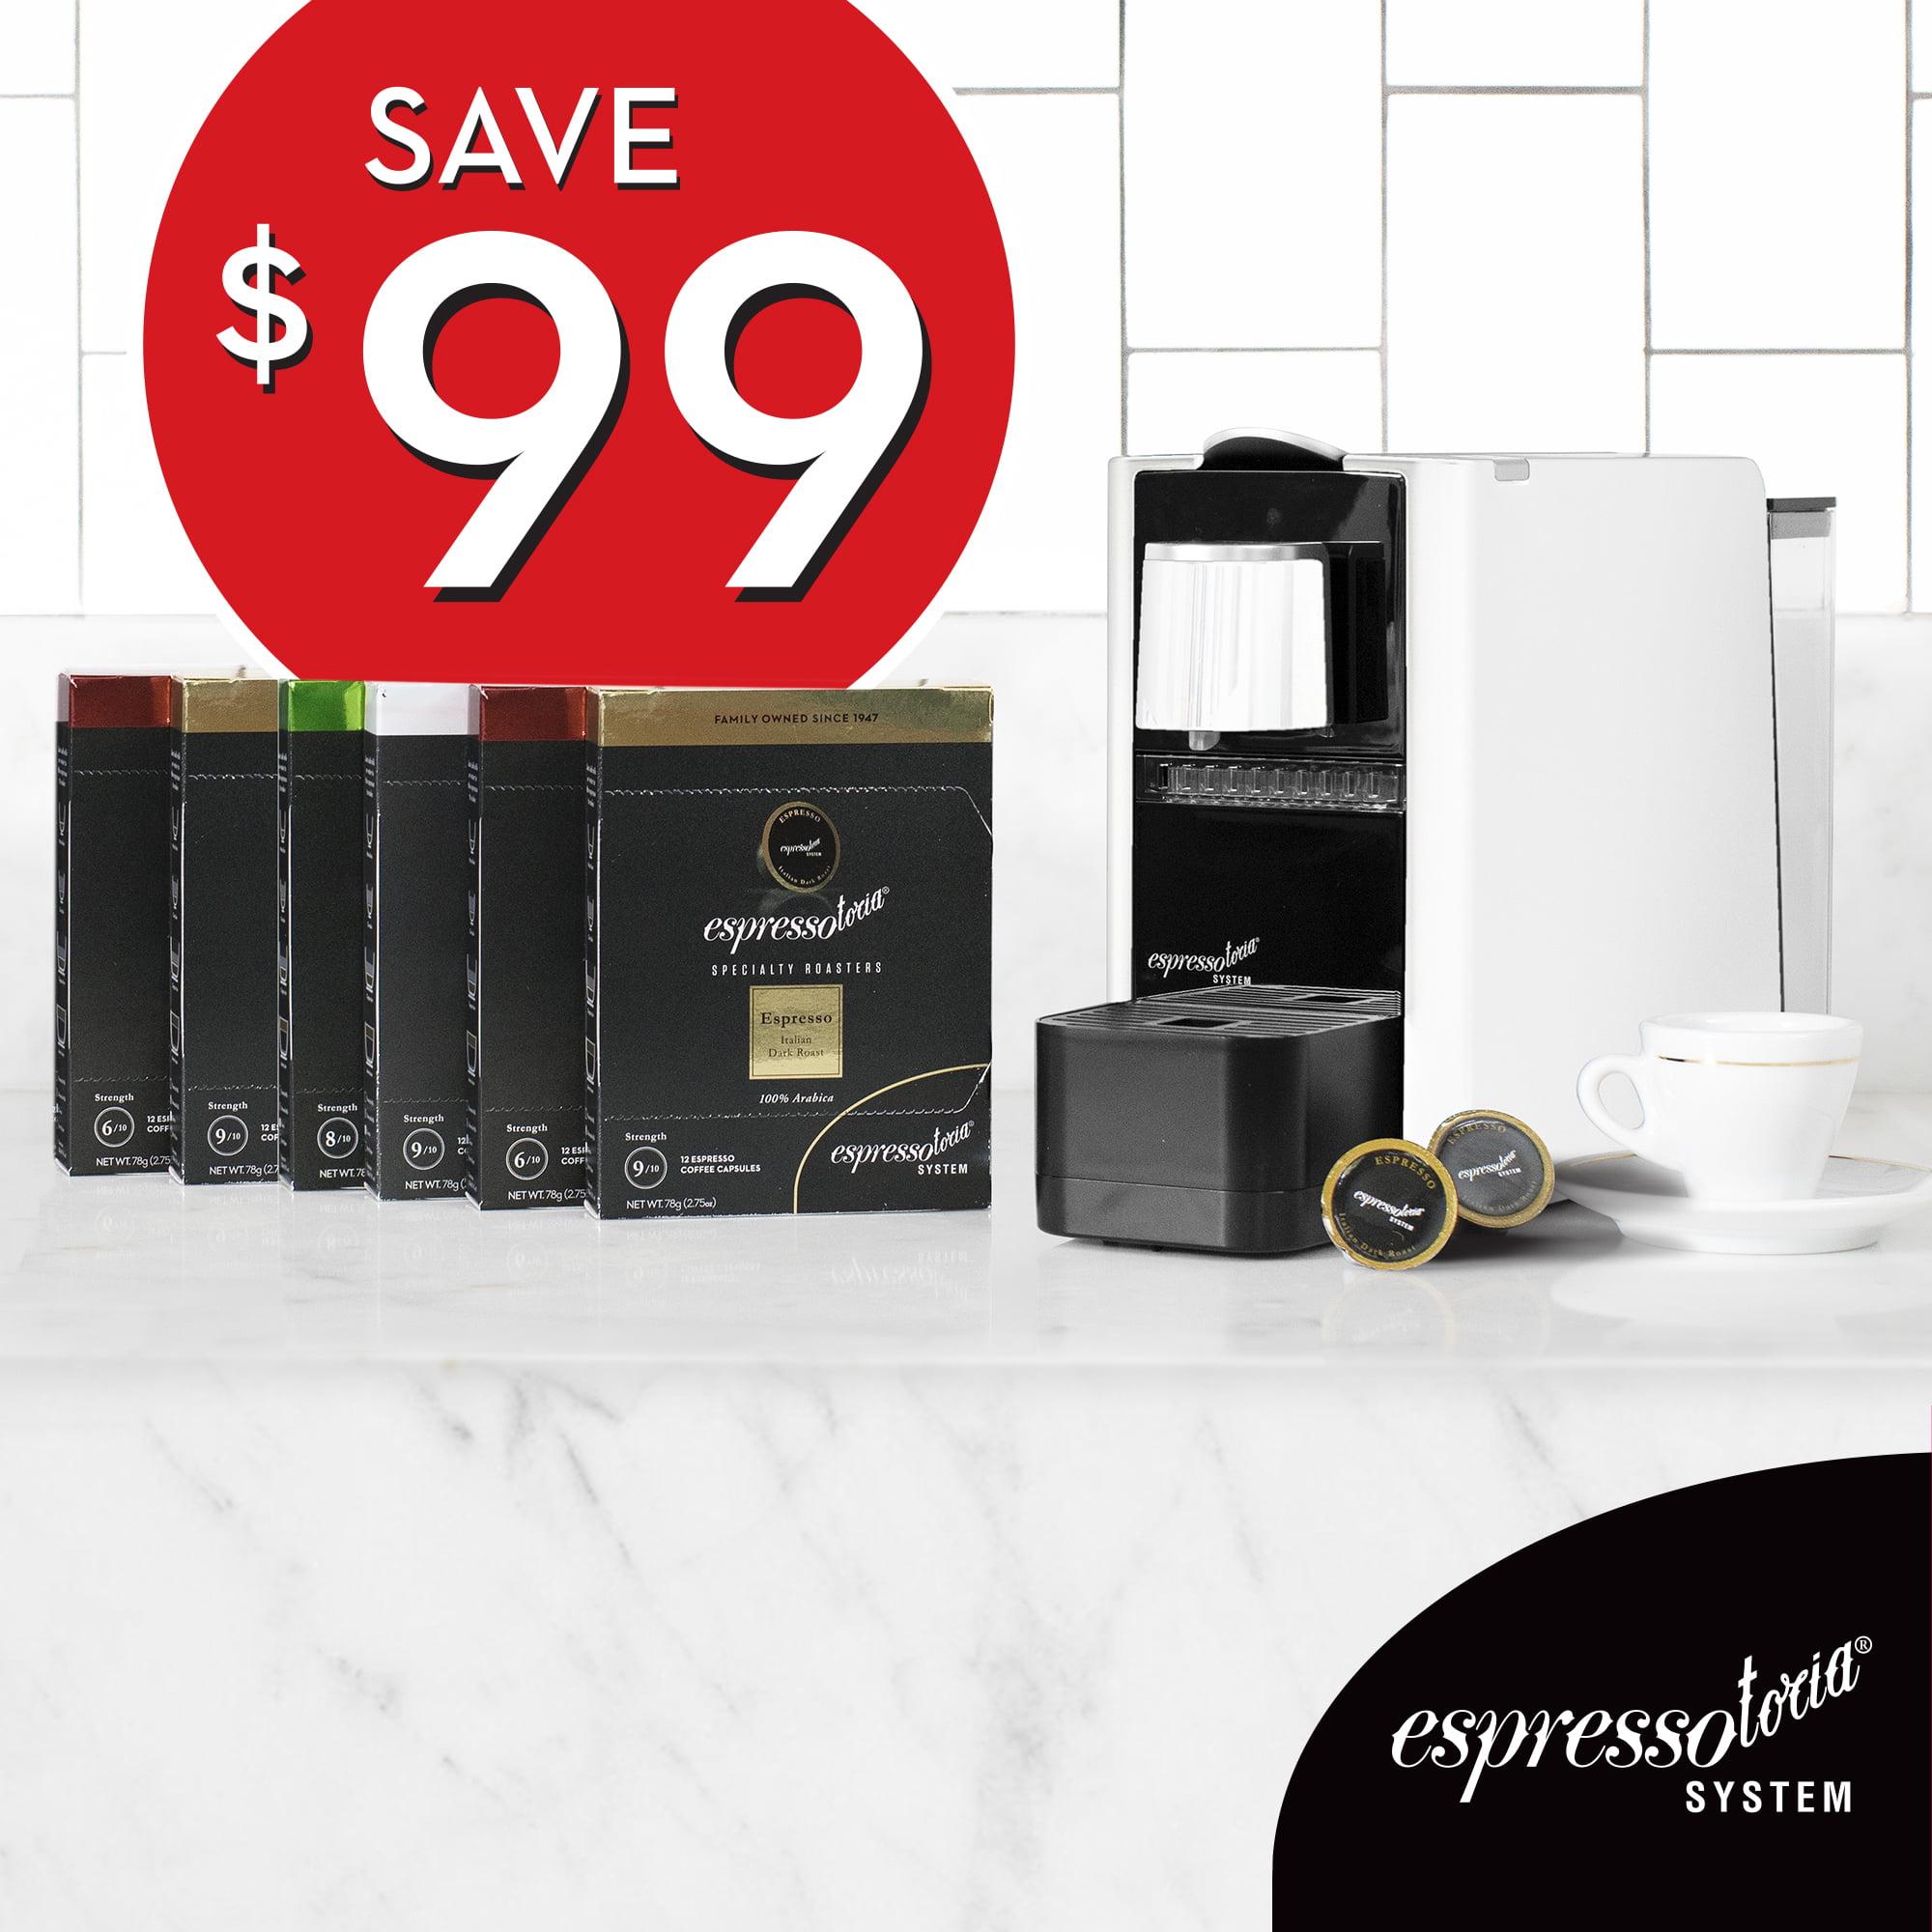 Meet Espressotoria. Buy 6 coffee pod packs, get FREE Espressotoria Machine.